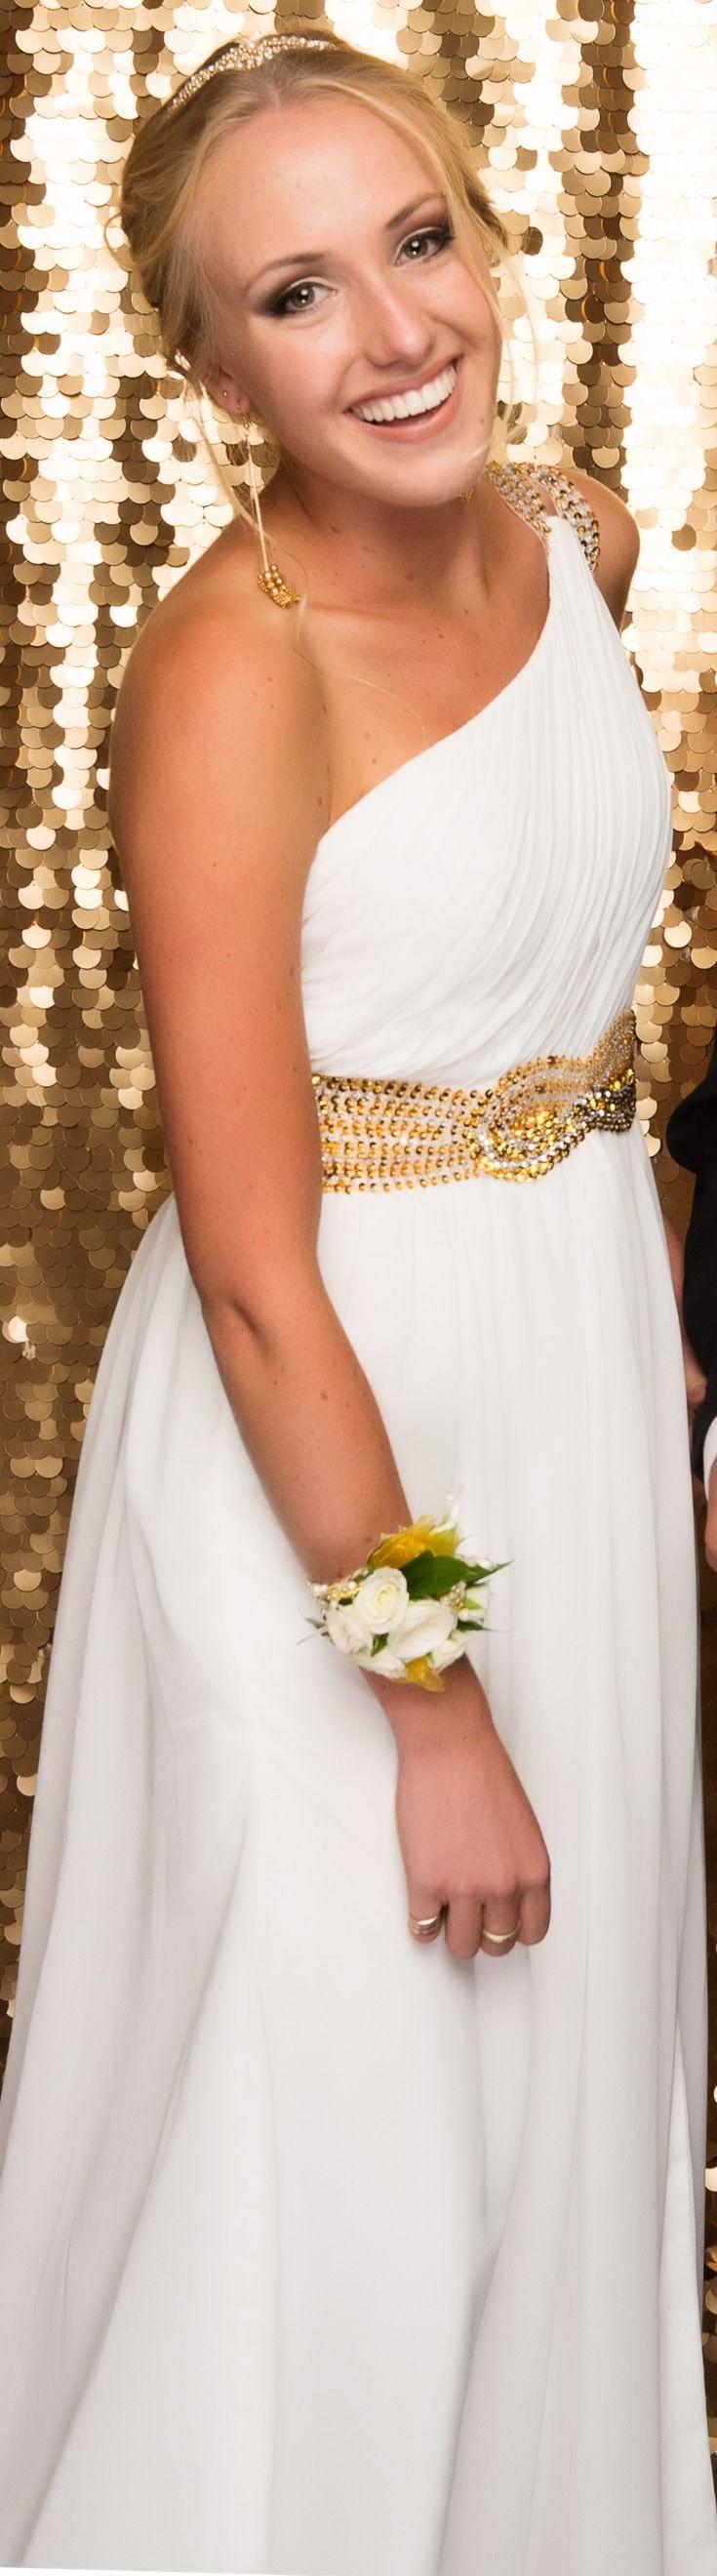 Kingsway Ball 2015. Gorgeous Grecian inspired look! www.whitedoor.co.nz